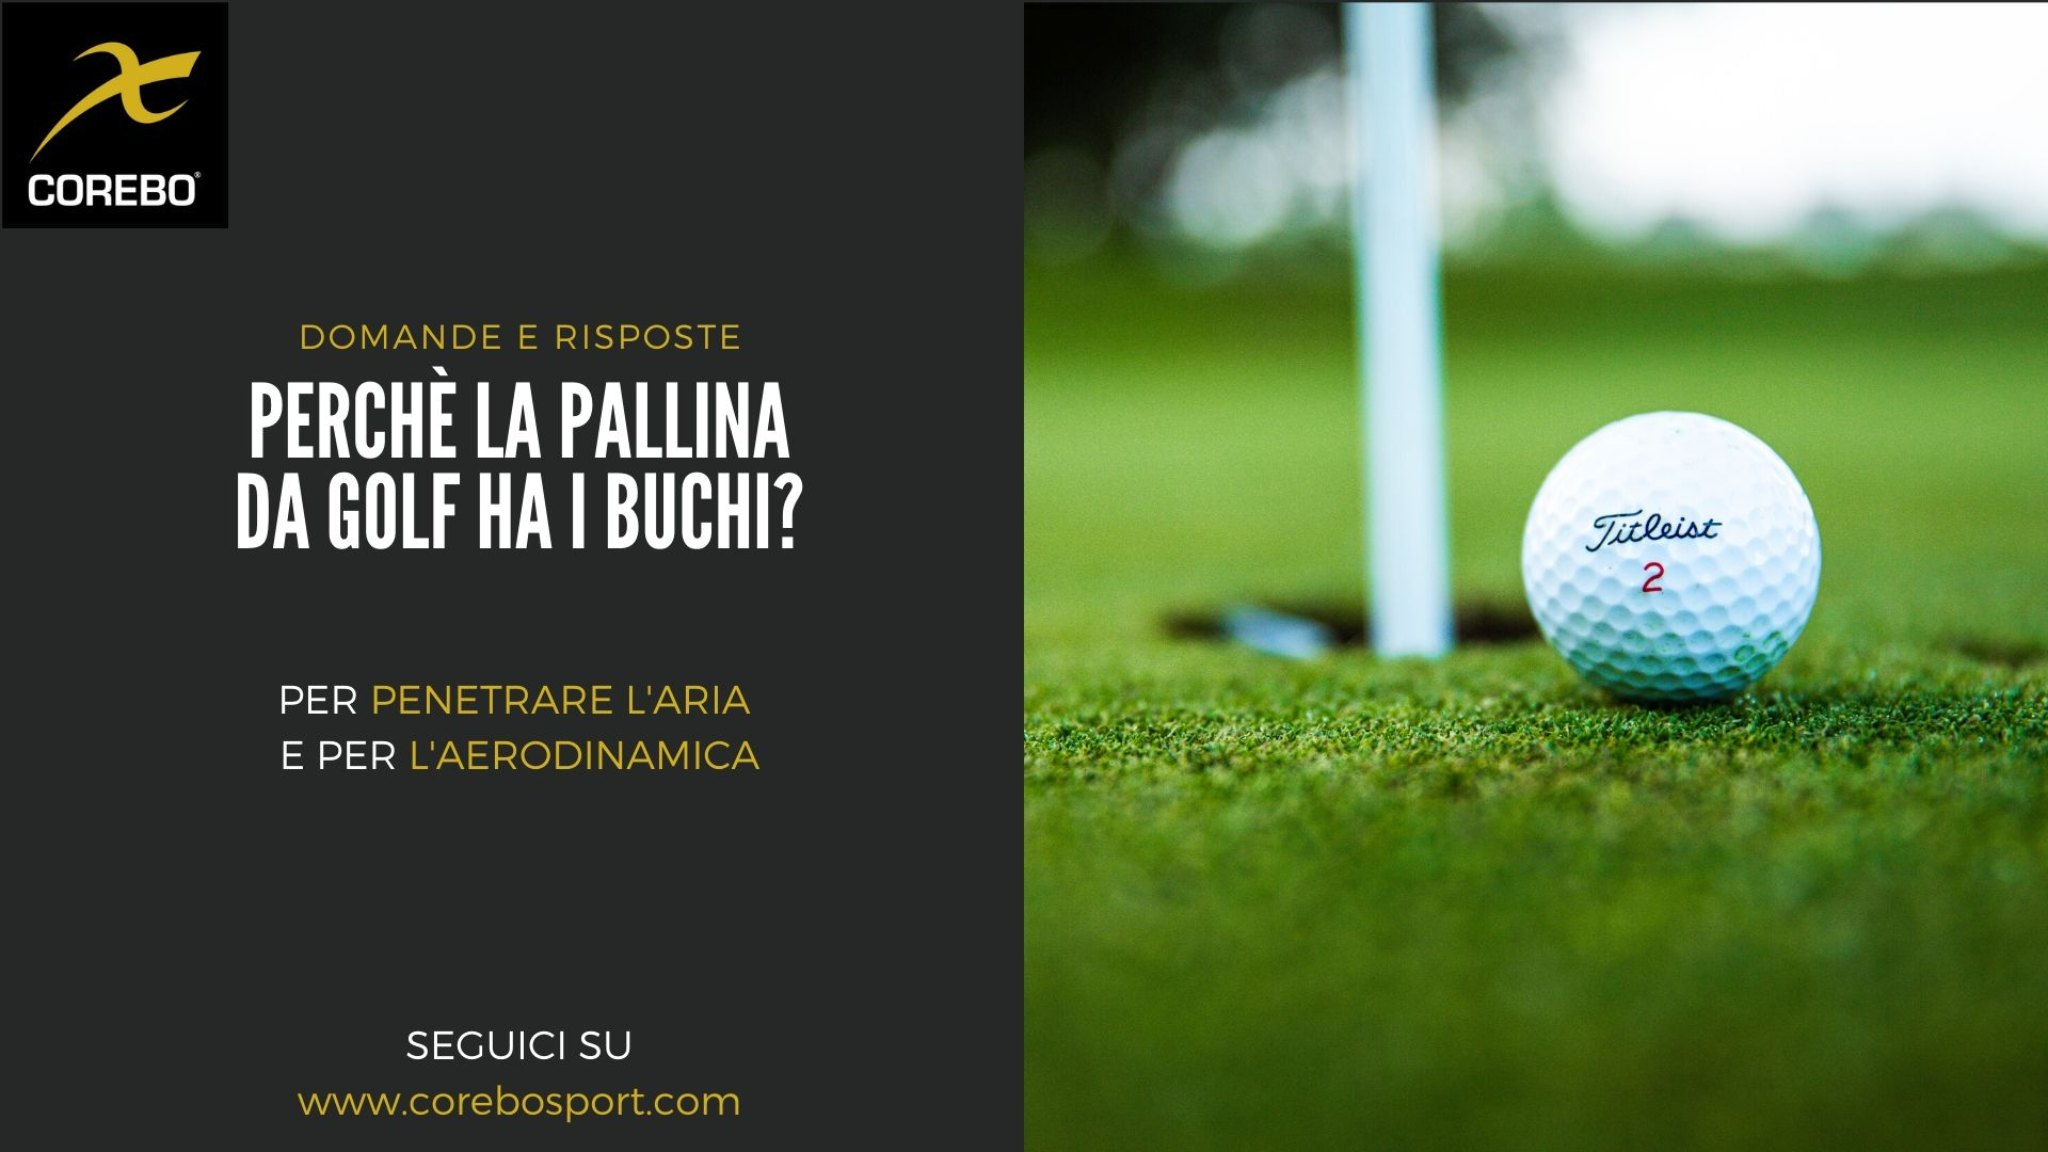 Perché la pallina da golf ha i buchi